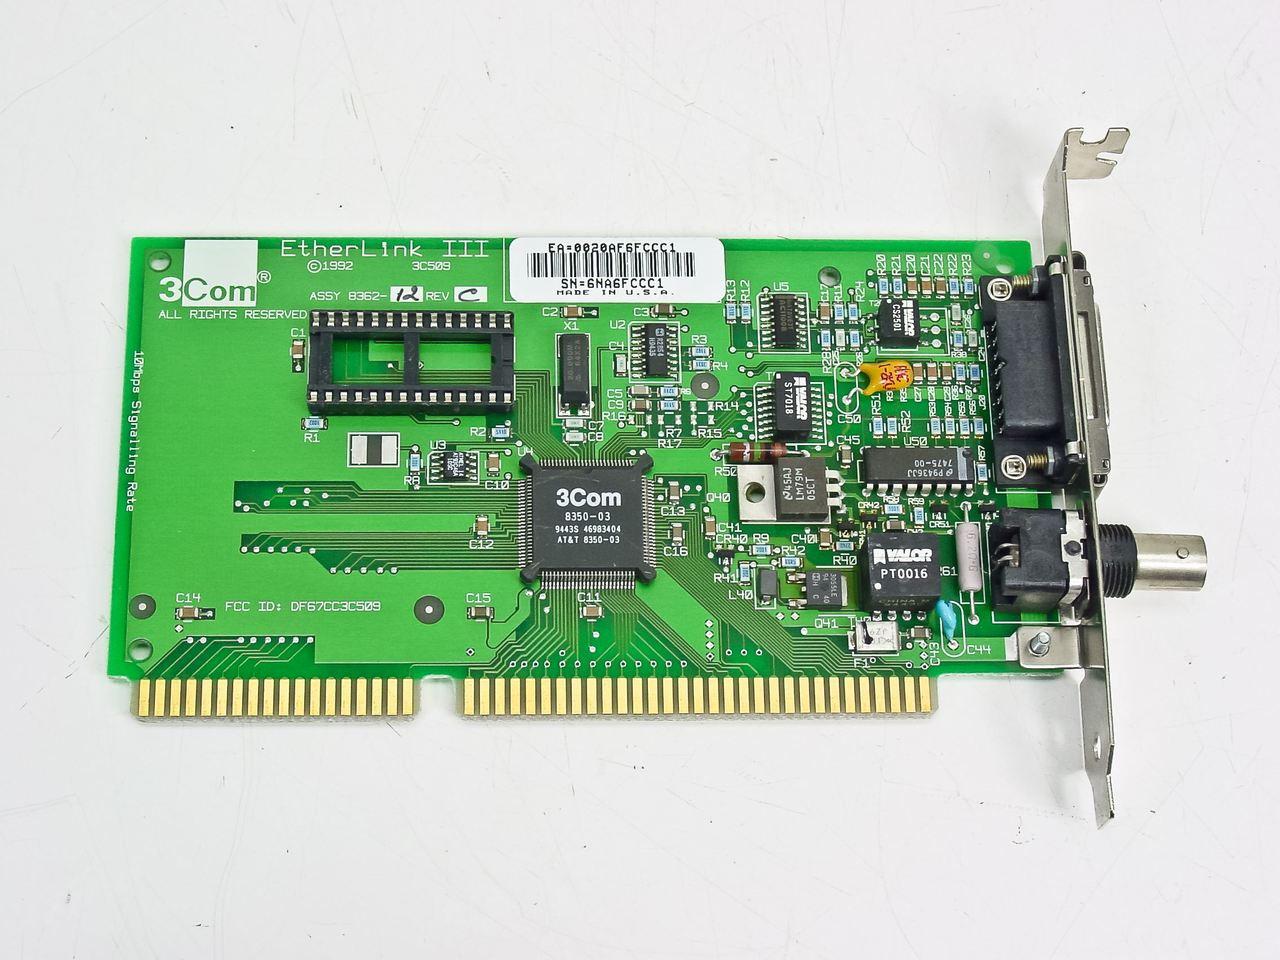 3COM 3C5X9 SERIES DRIVER FOR WINDOWS MAC